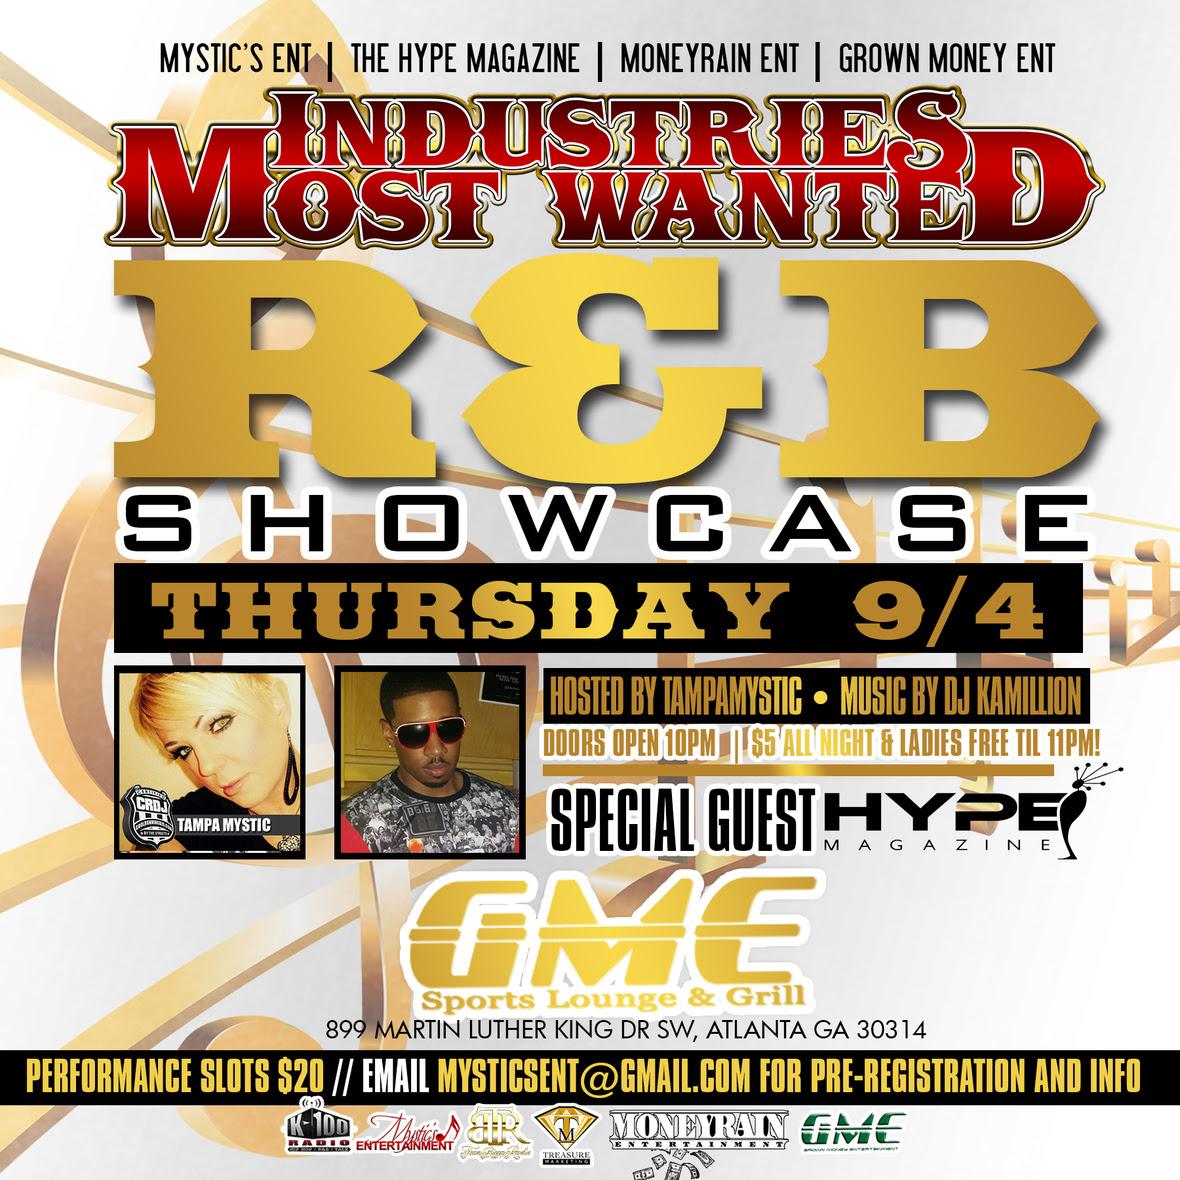 Tampa Mystic - IMW - RNB Showcase - 9-4